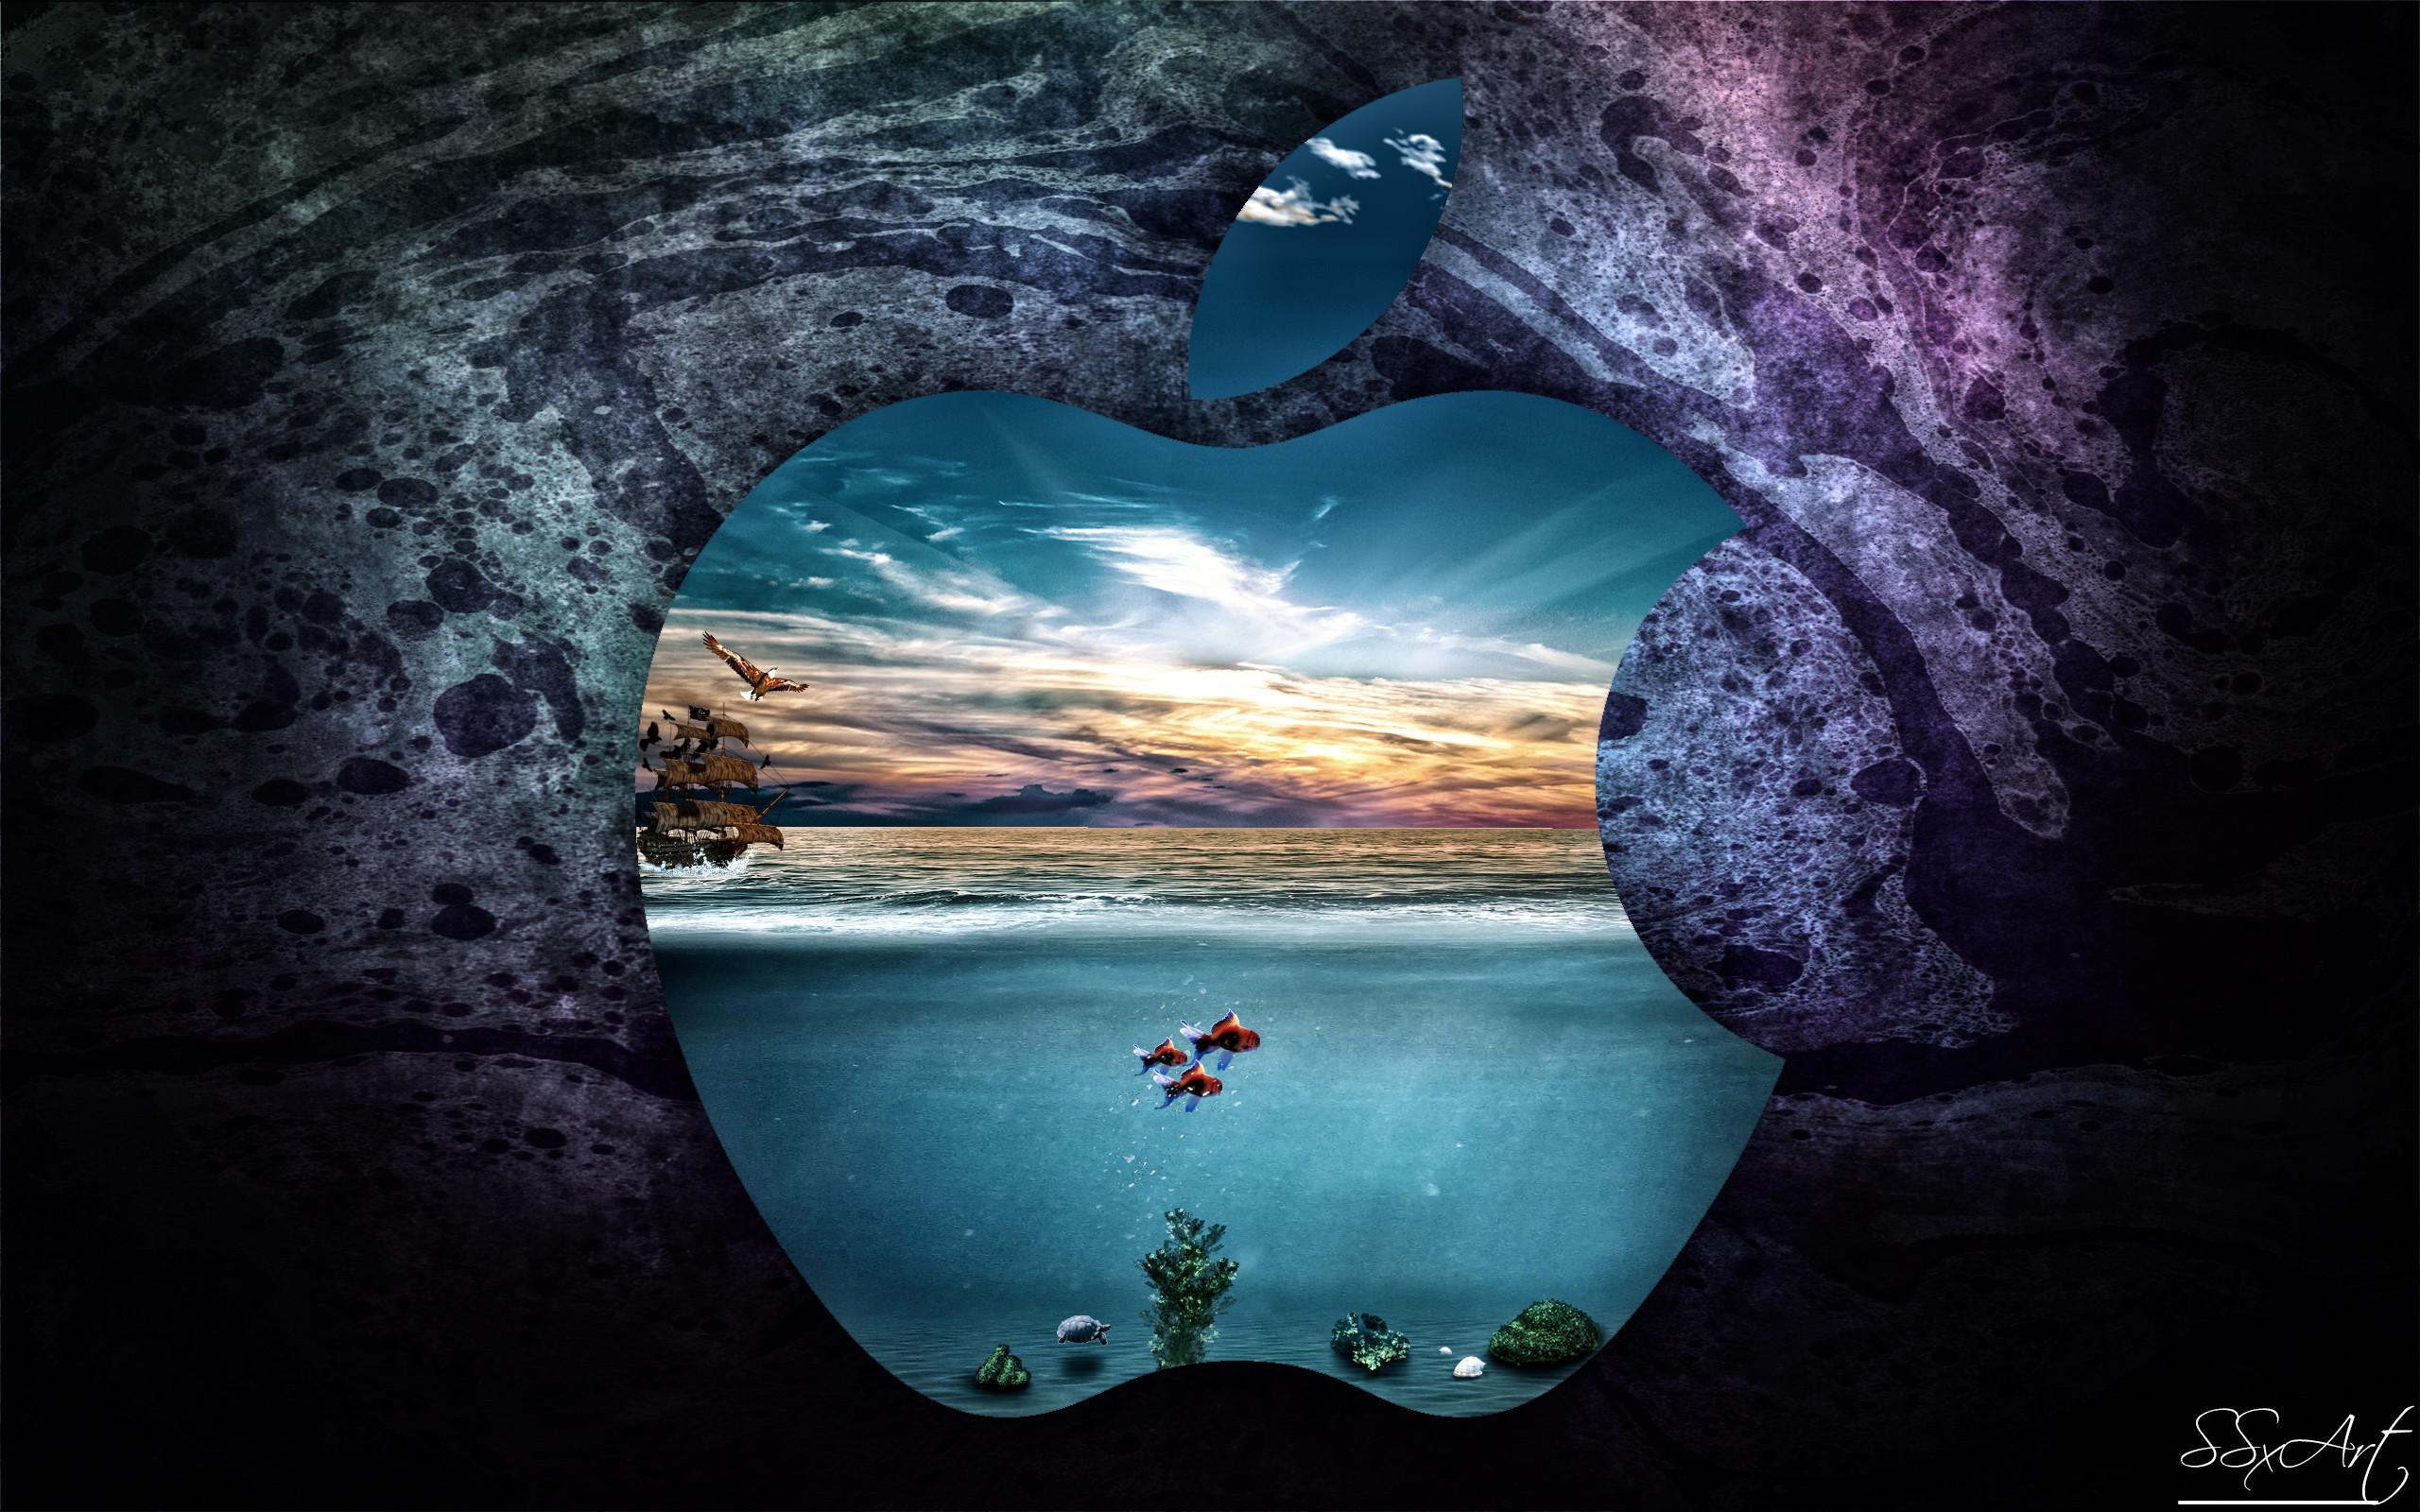 Macbook pro retina desktop wallpaper 60 images - Wallpaper for mac pro 13 ...